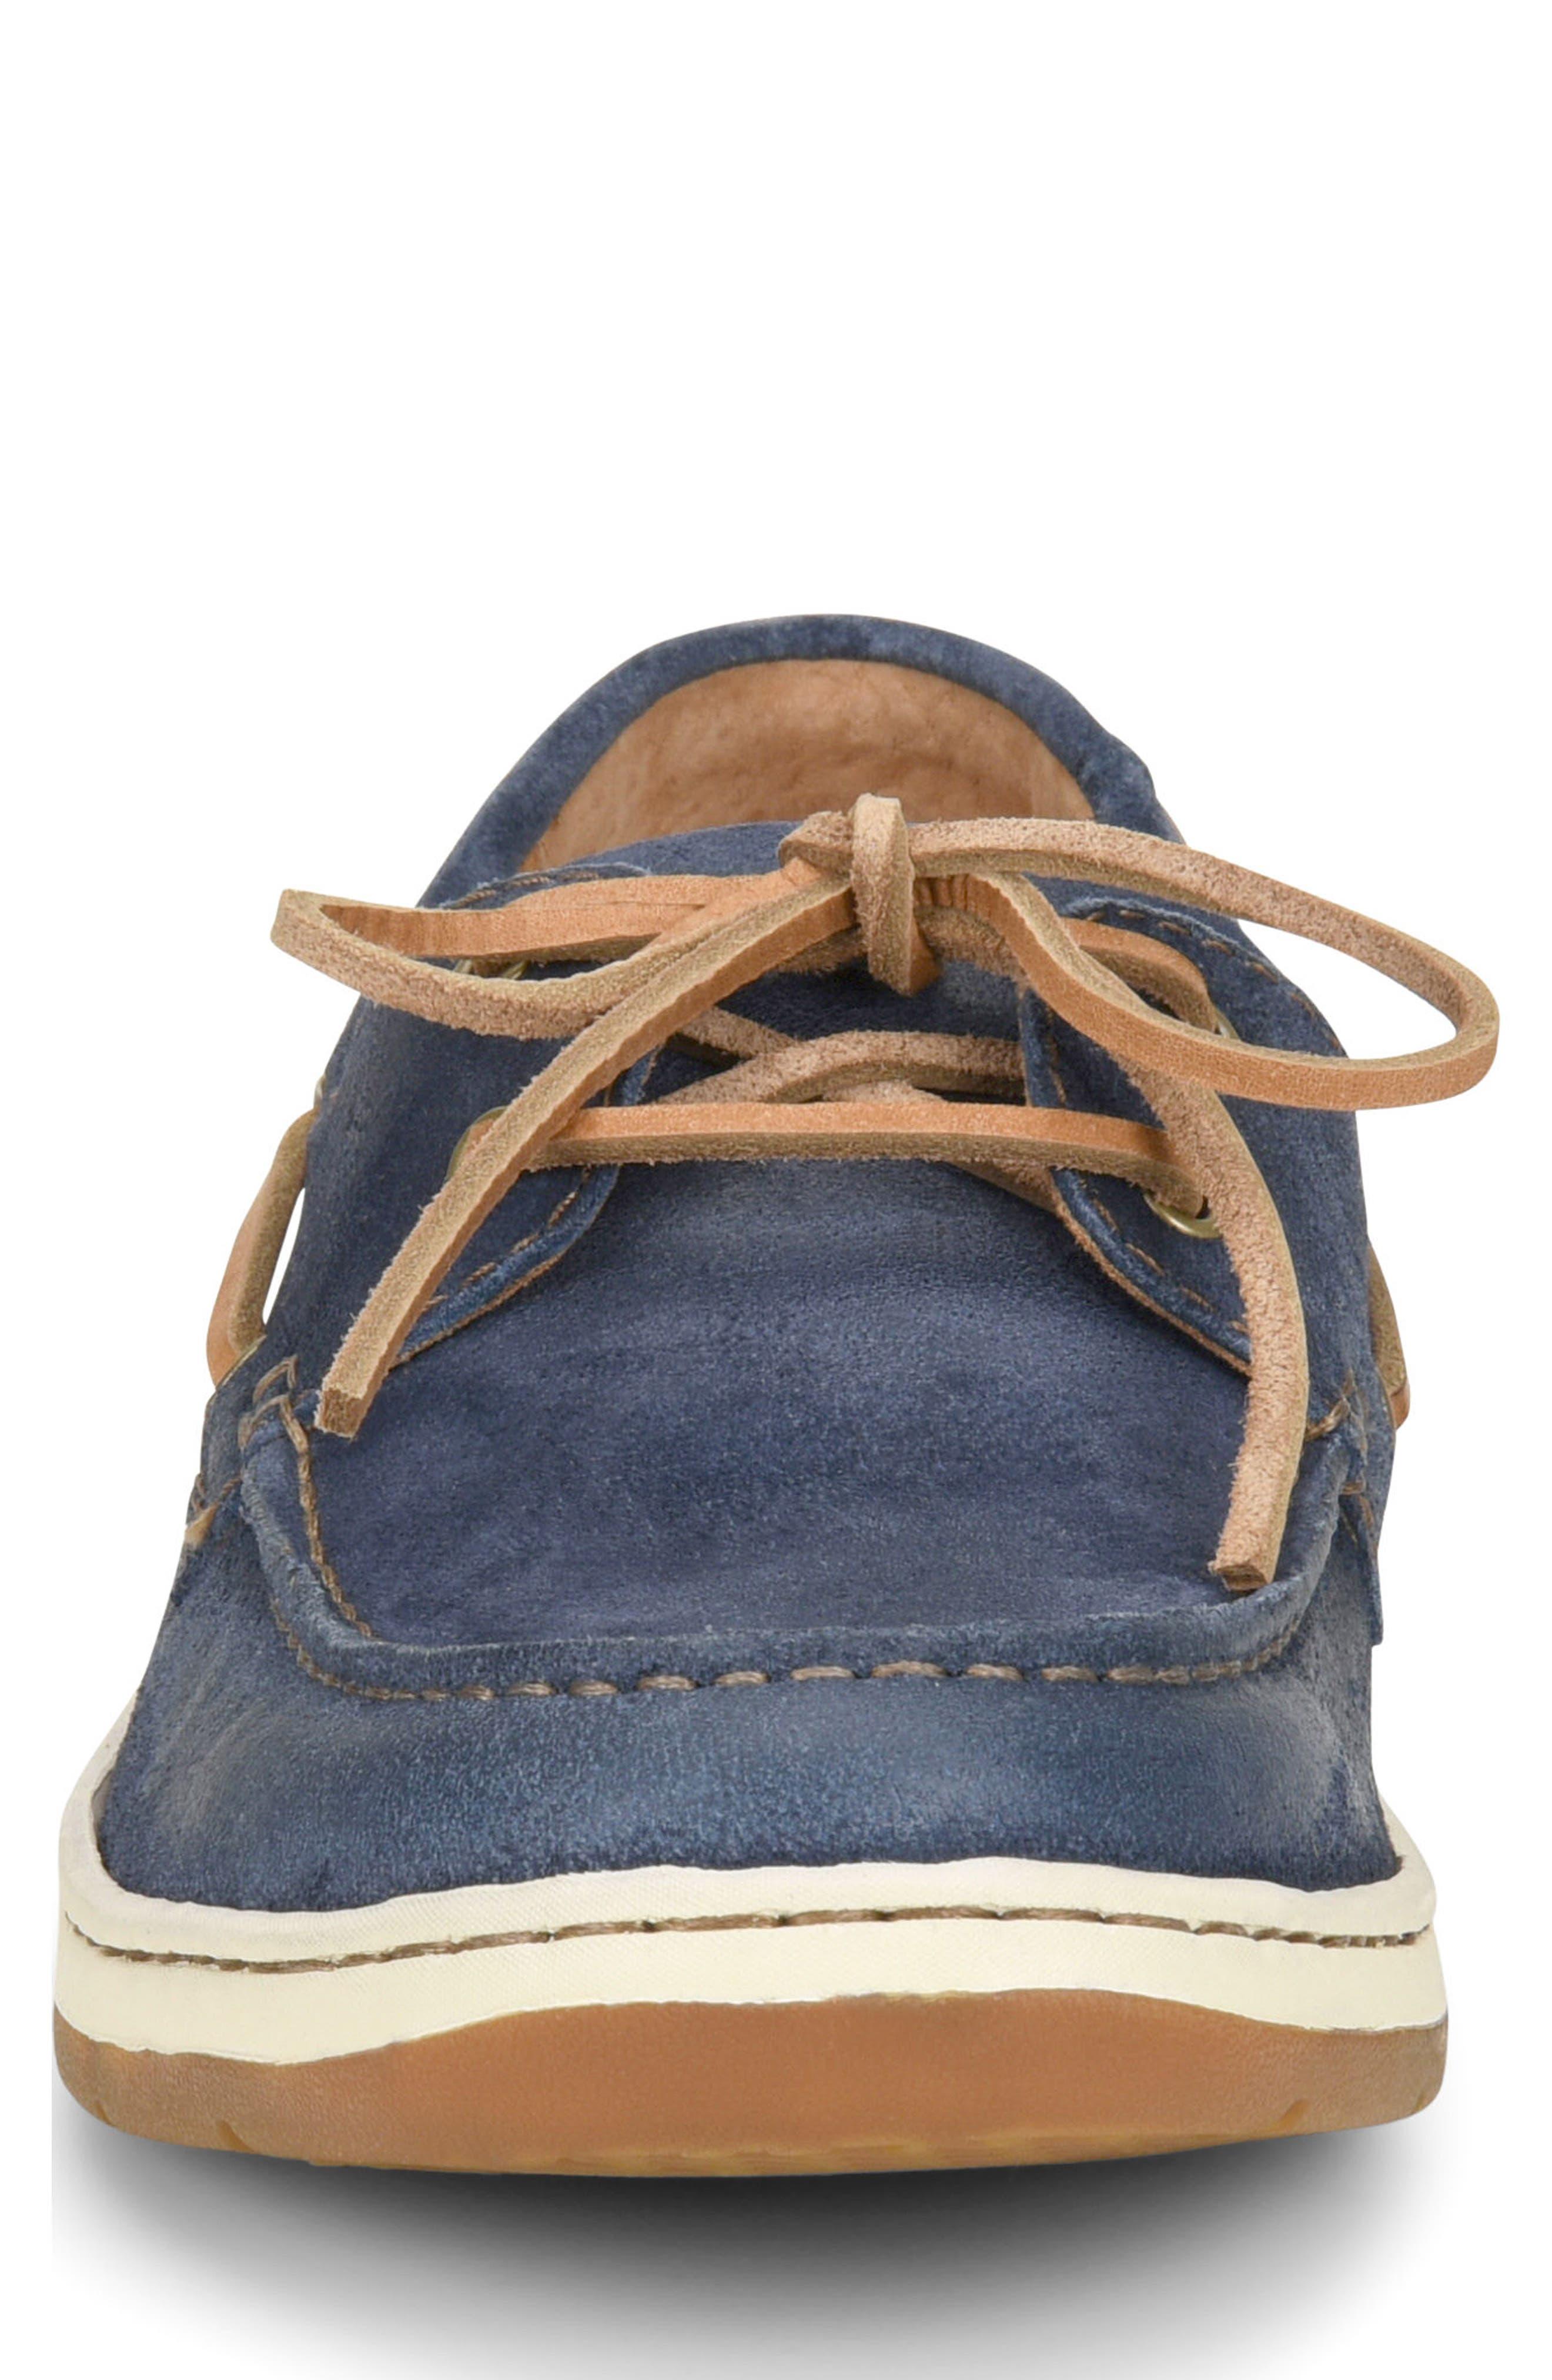 Ocean Boat Shoe,                             Alternate thumbnail 4, color,                             Dark Blue Leather